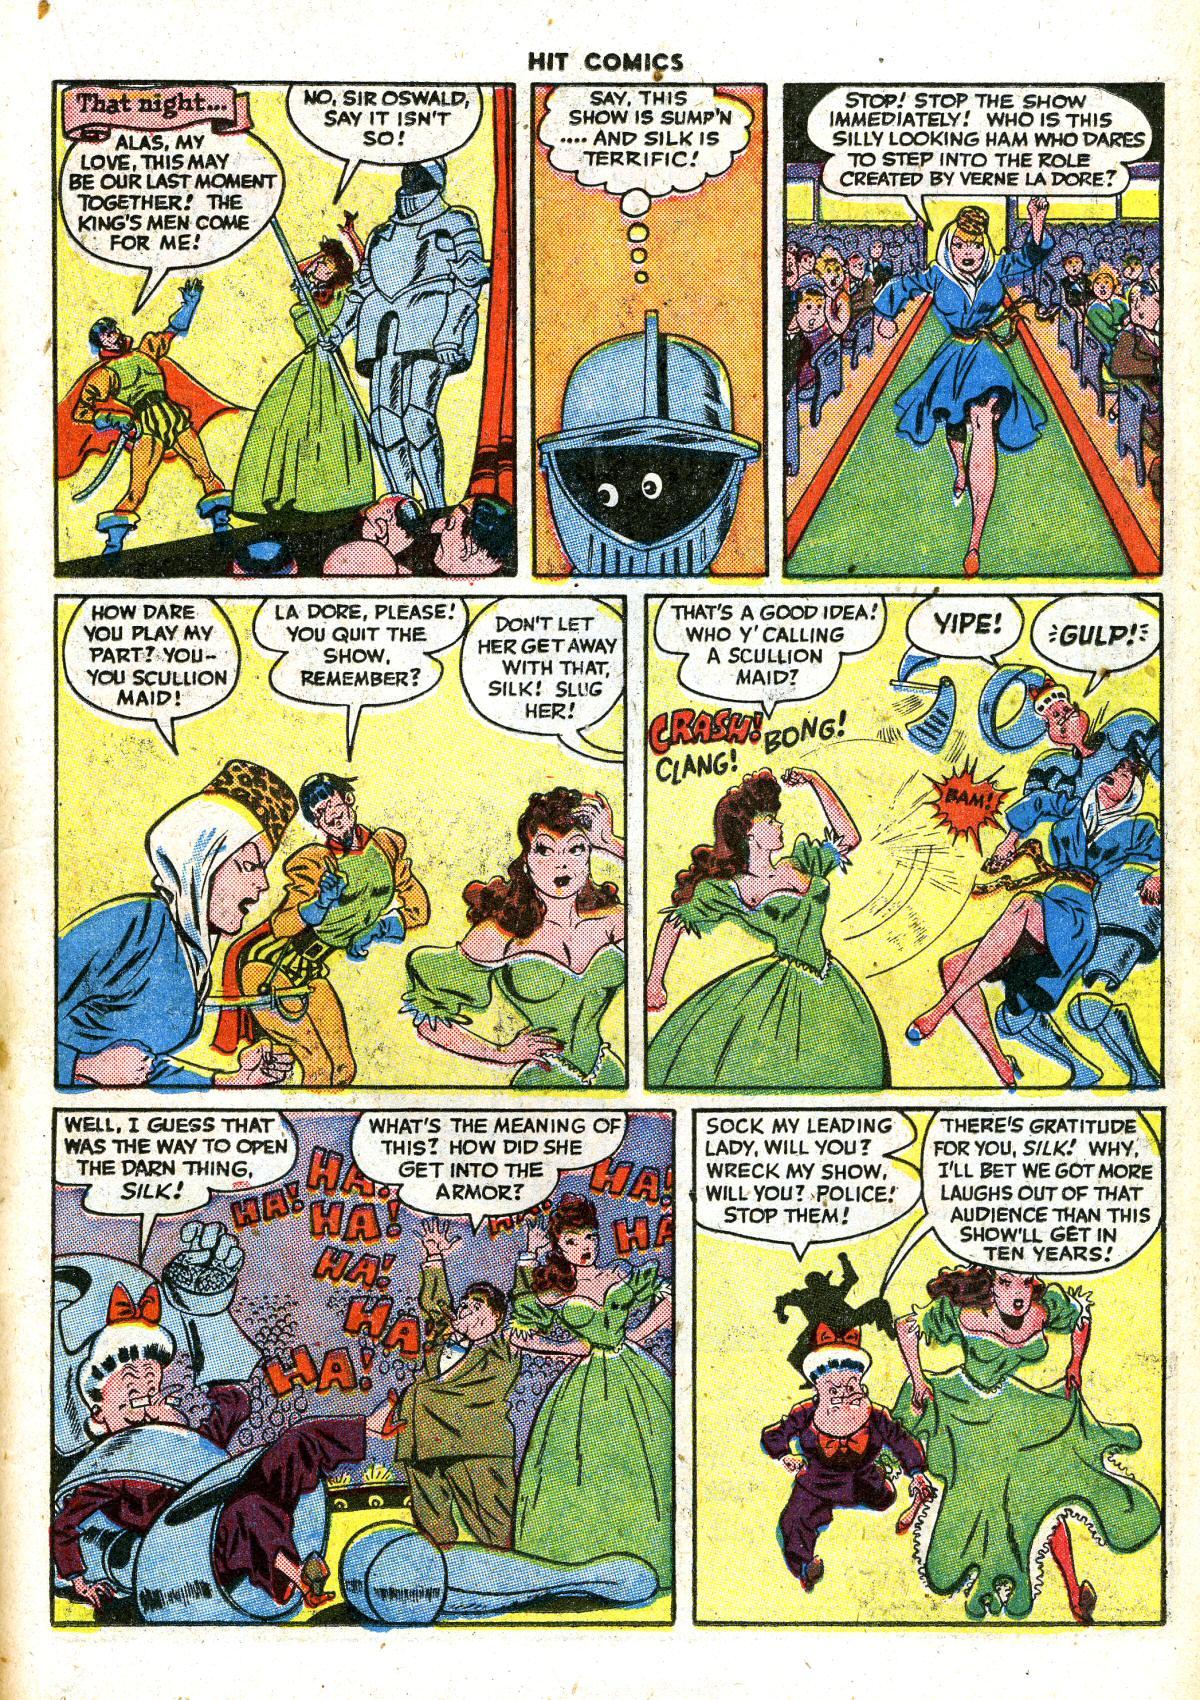 Read online Hit Comics comic -  Issue #41 - 29